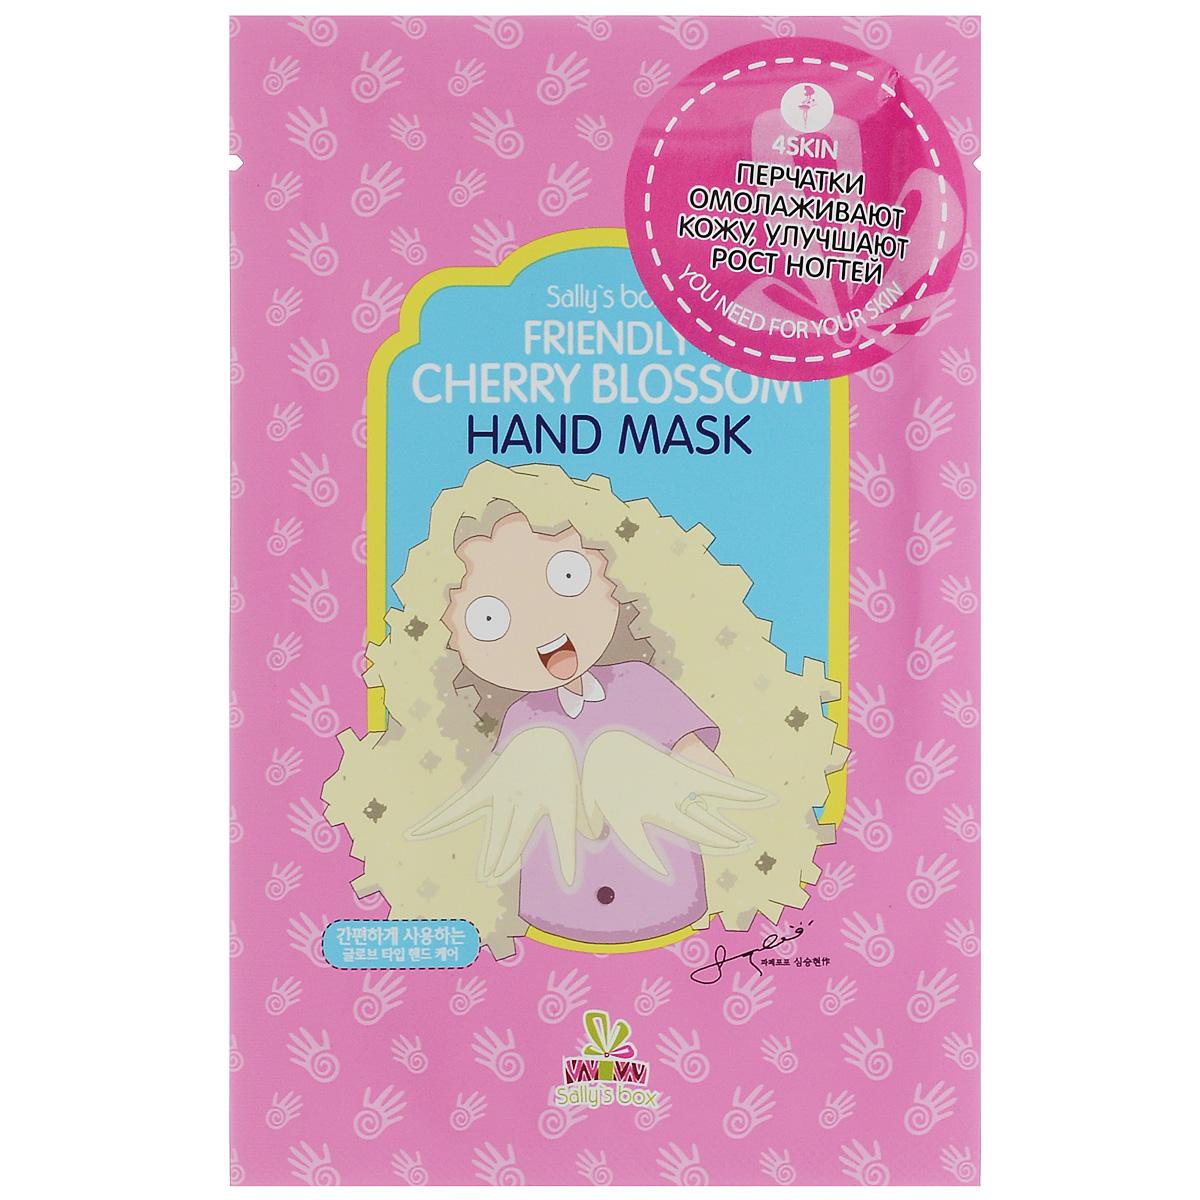 SALLY`S BOX Увлажняющие перчатки CHEERY BLOSSOM косметические маски royal skin увлажняющие перчатки для рук aromatherapy lavender х 2 шт